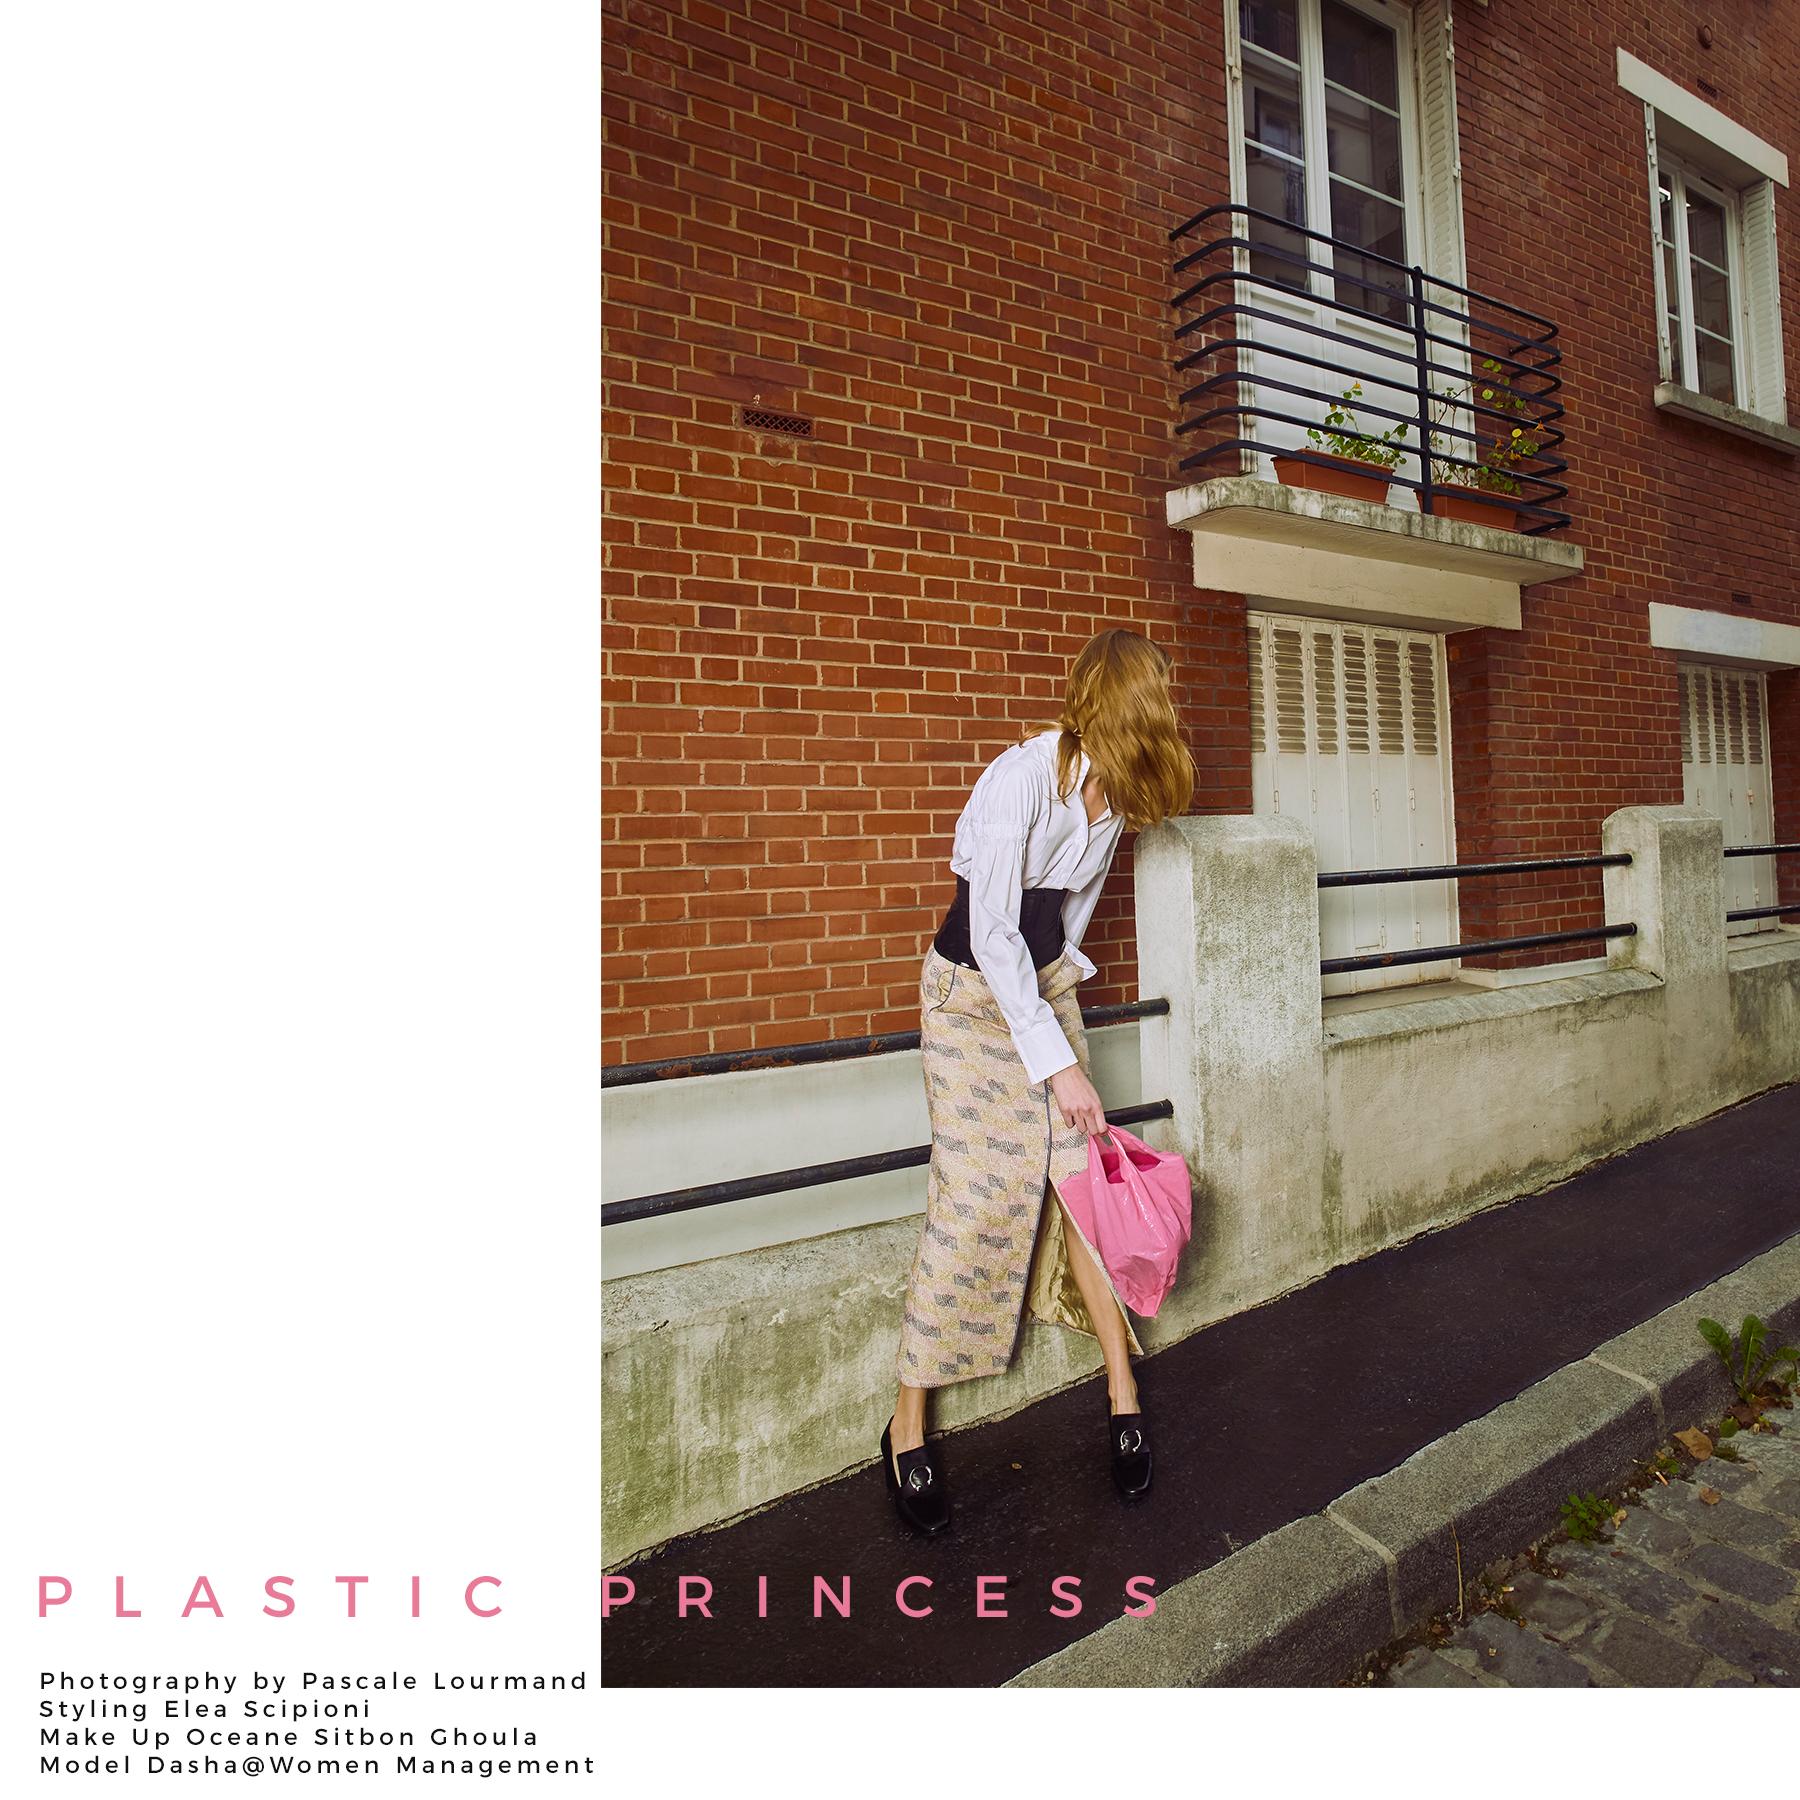 JusteMagazine_PlasticPrincess_PascaleLourmand1